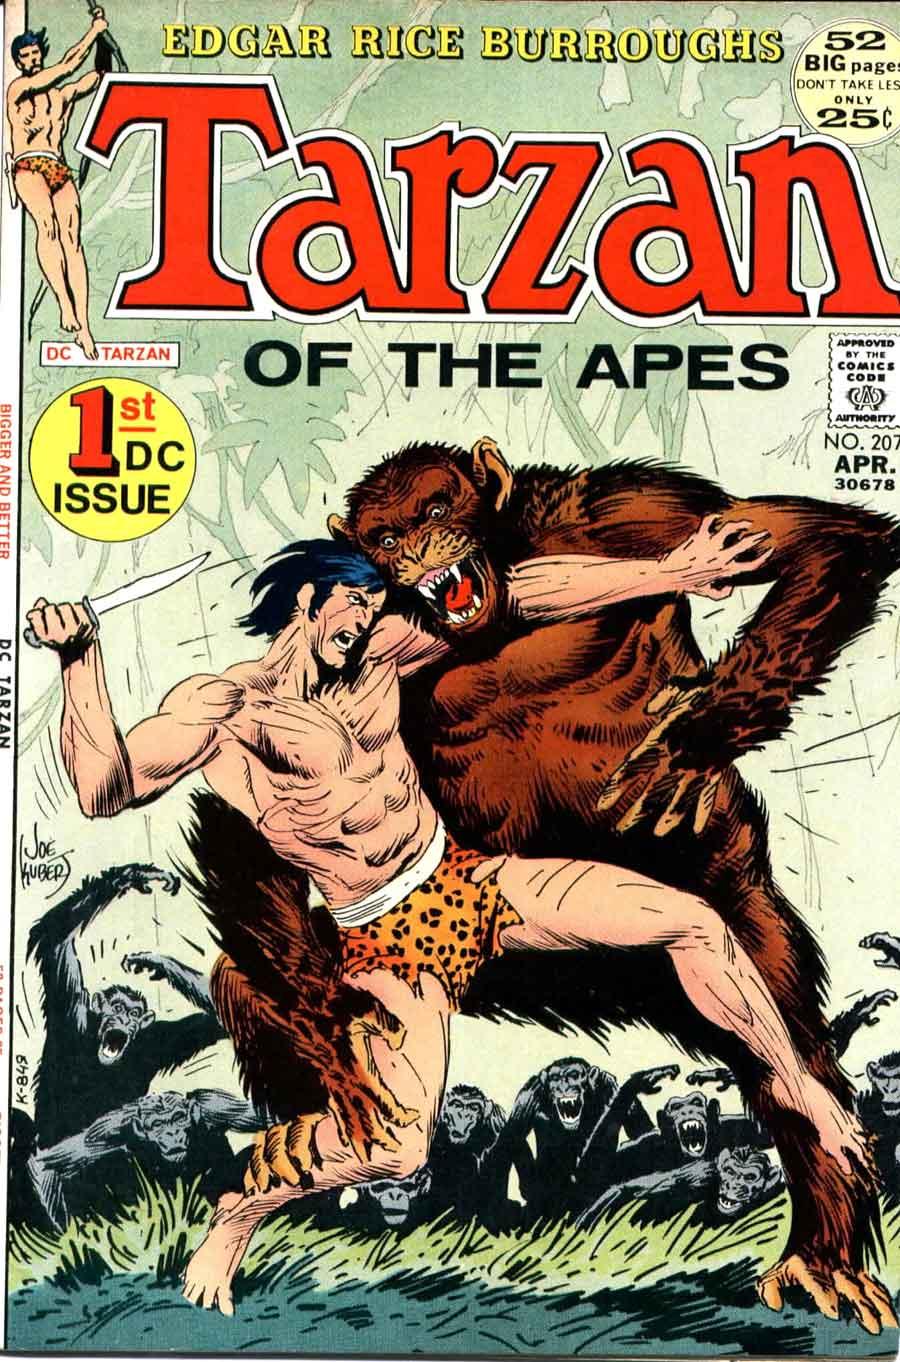 Tarzan v1 #207 dc comic book cover art by Joe Kubert